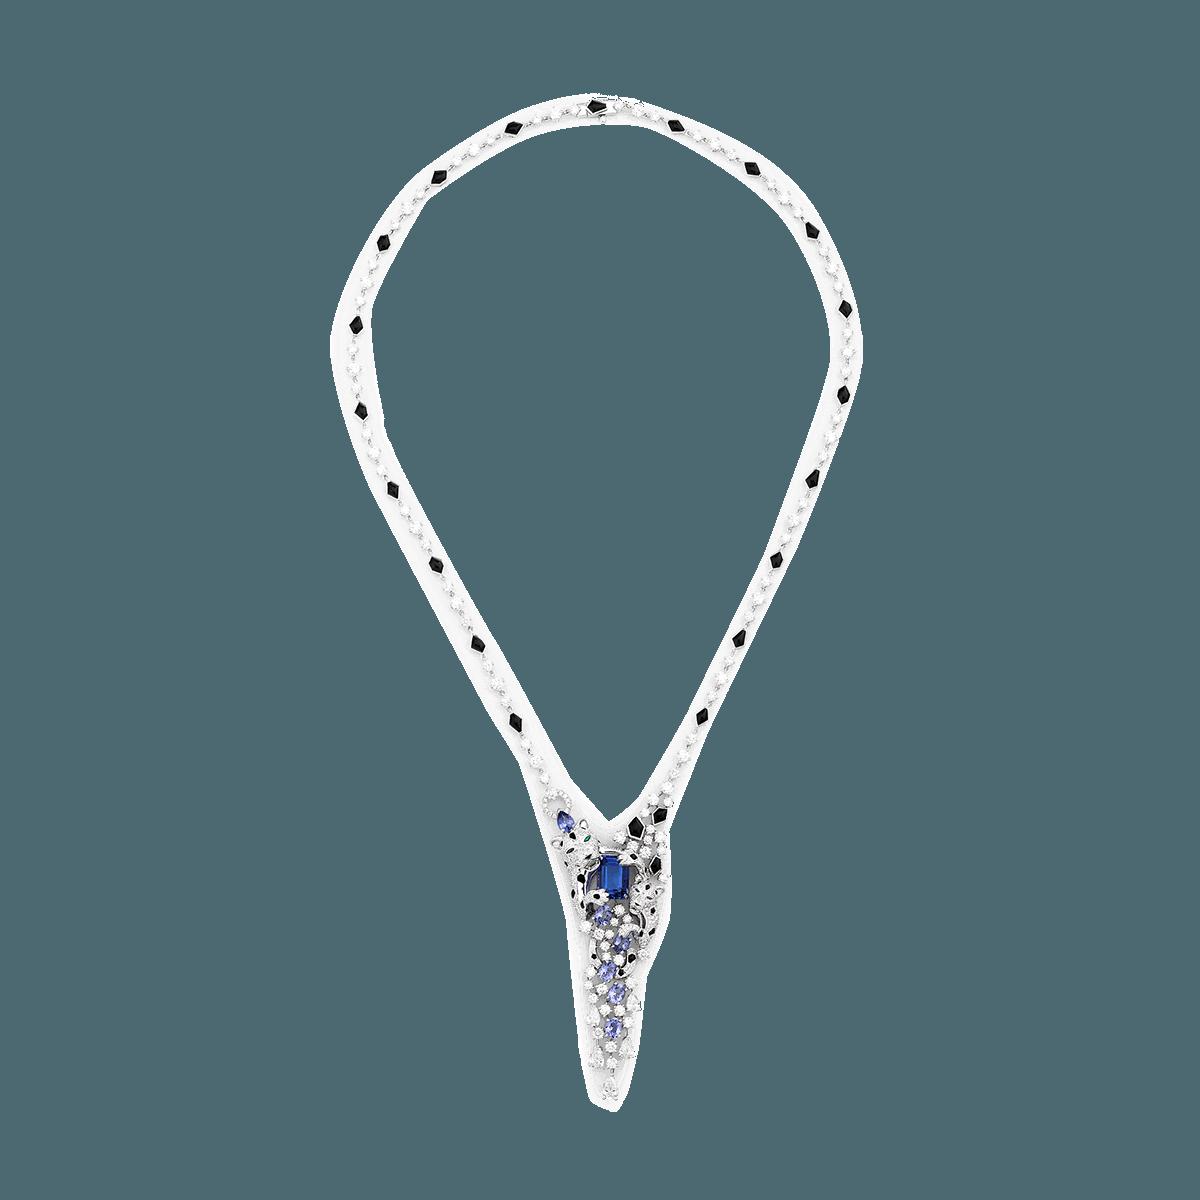 Sartoro FAUNA - SNOW LEOPARD Necklace SLEO-N4WGTZON